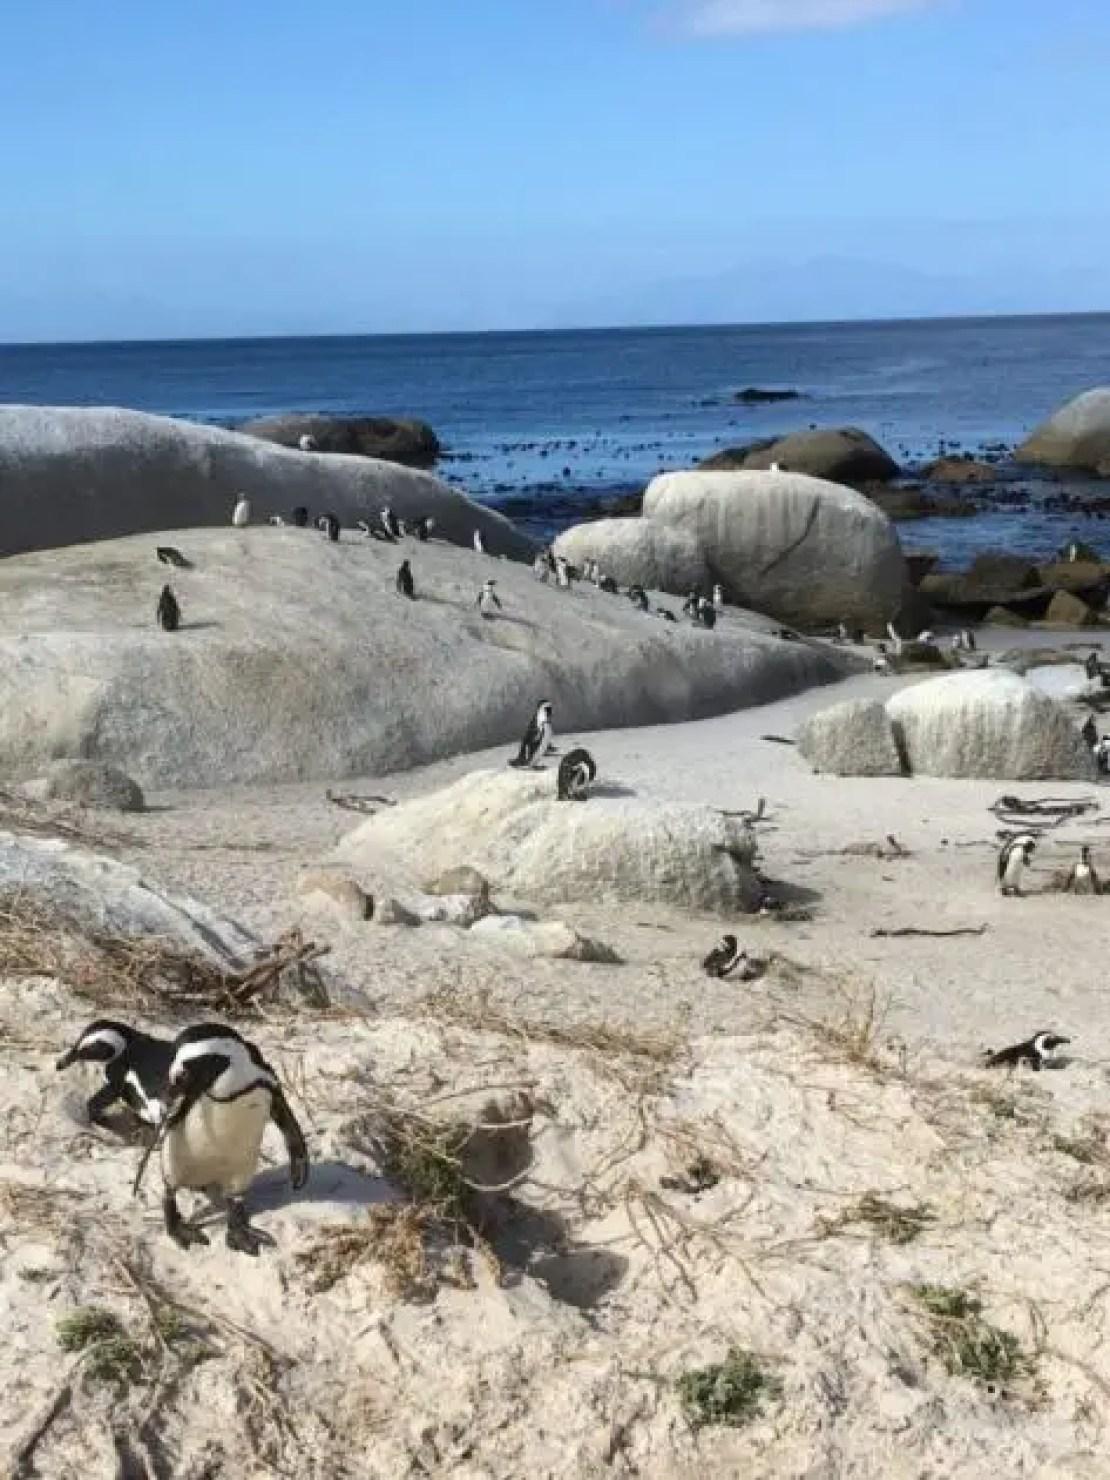 Penguins so many penguins